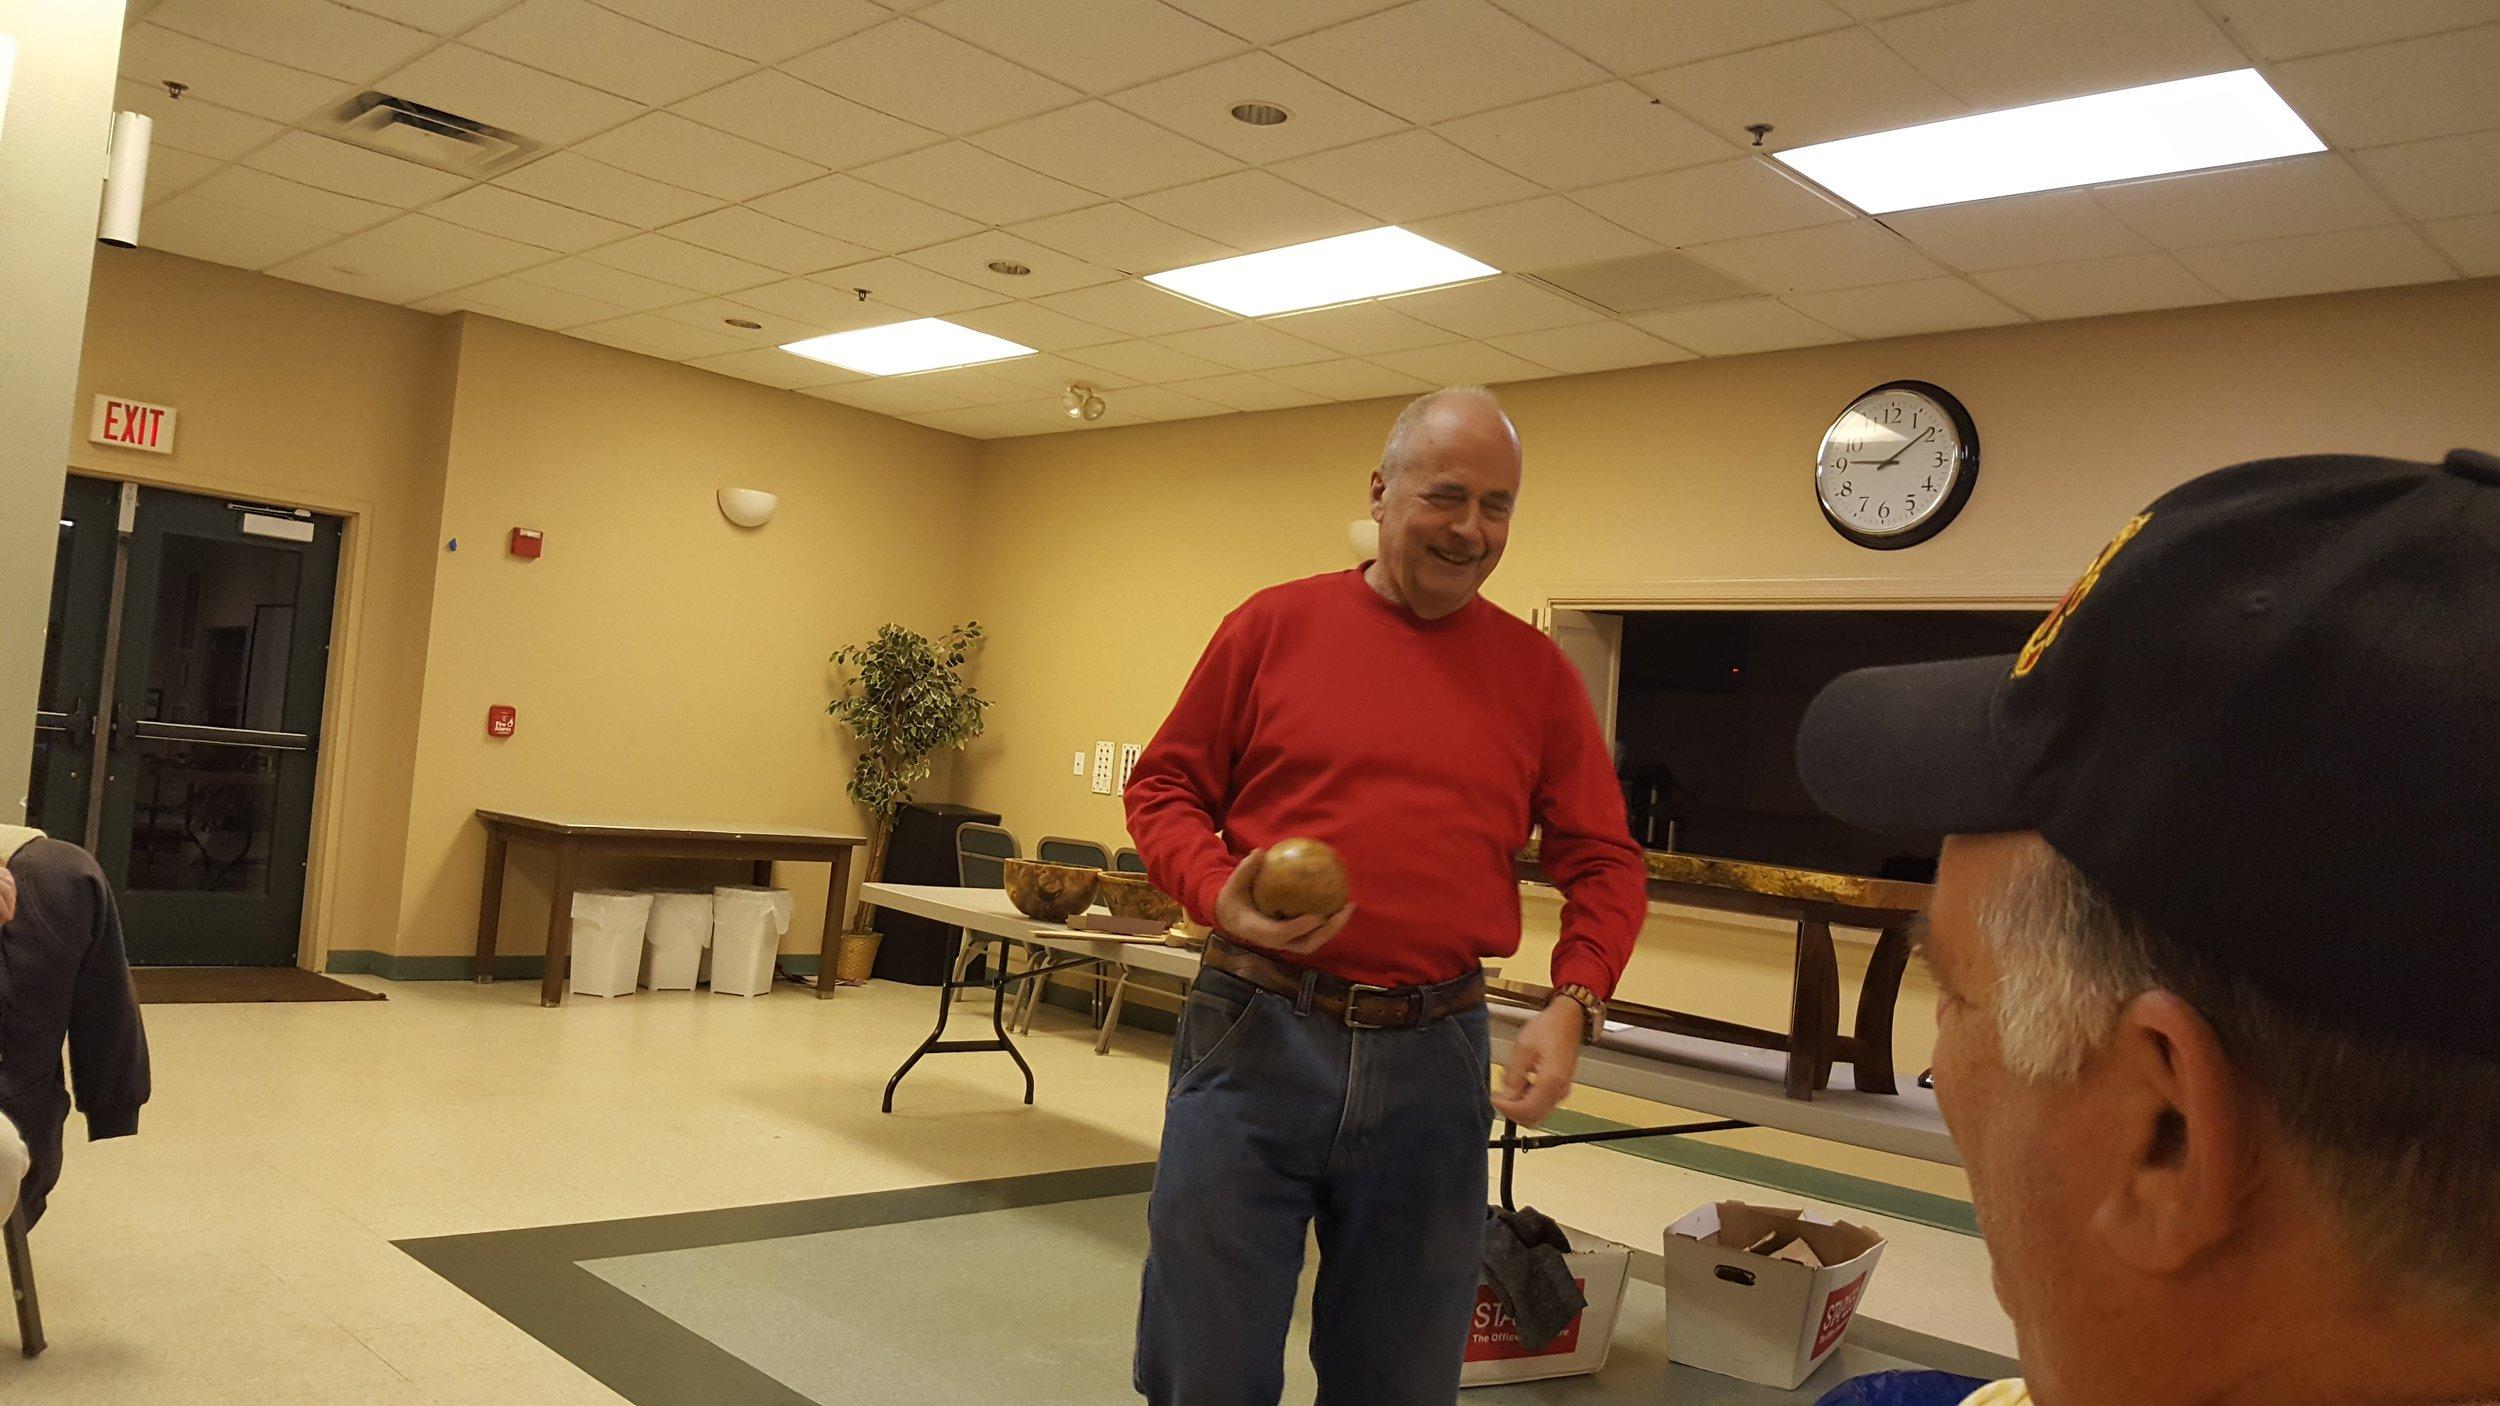 Phil's sphere